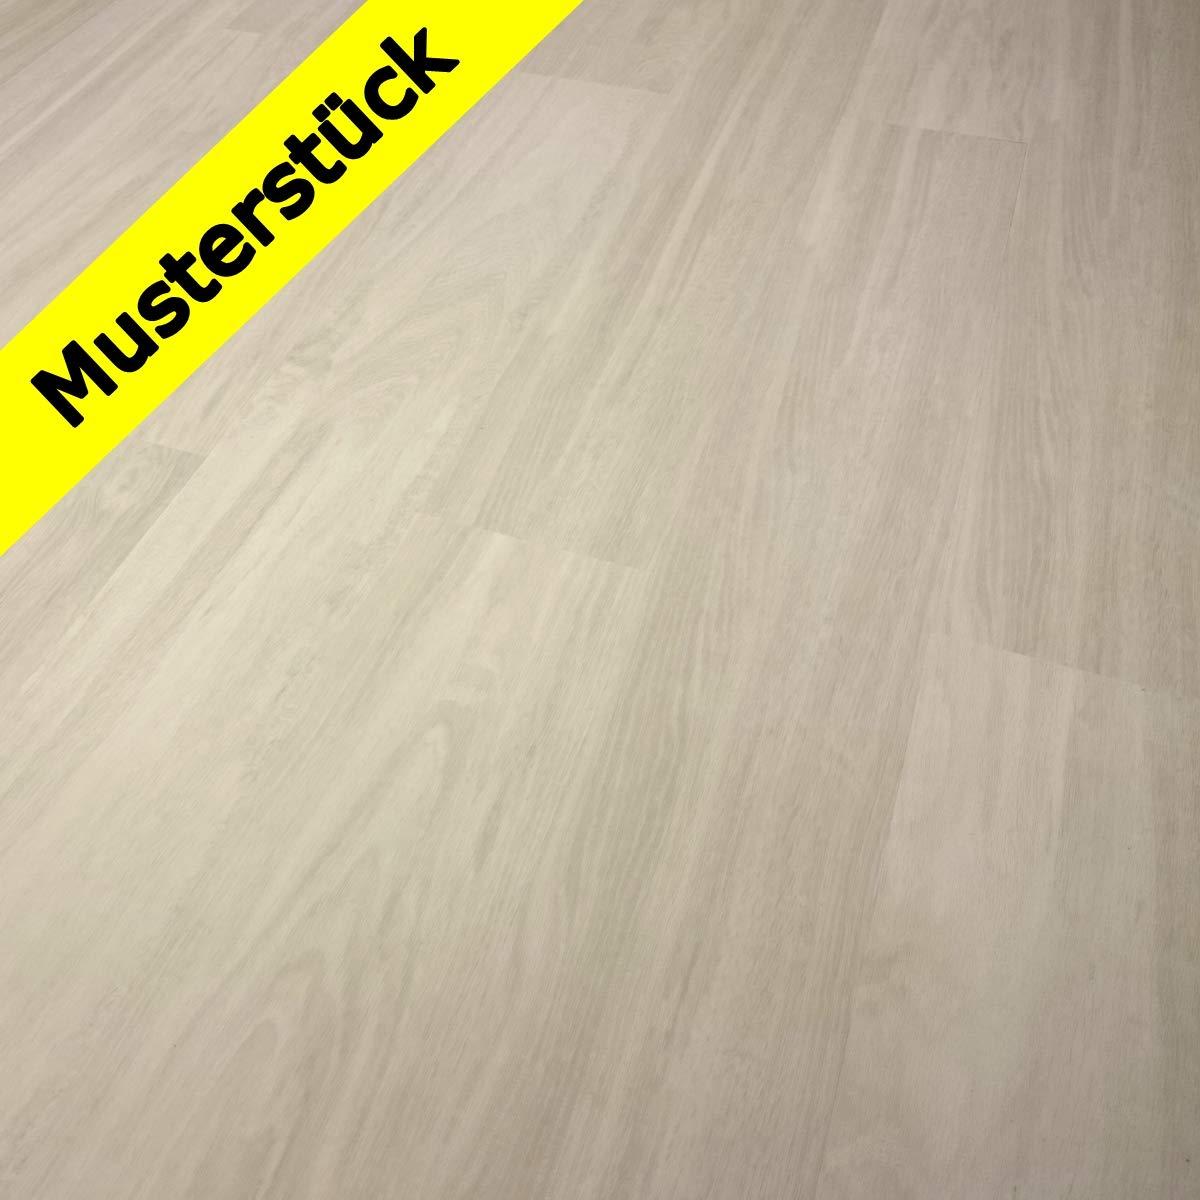 Sockelleiste f/ür TRECOR/® Klick Vinylboden WASSERFEST - H/öhe: 60 mm Tiefe: 18 mm Sockelleiste   1 St/ück, Eiche Old Rustik L/änge: 240 cm